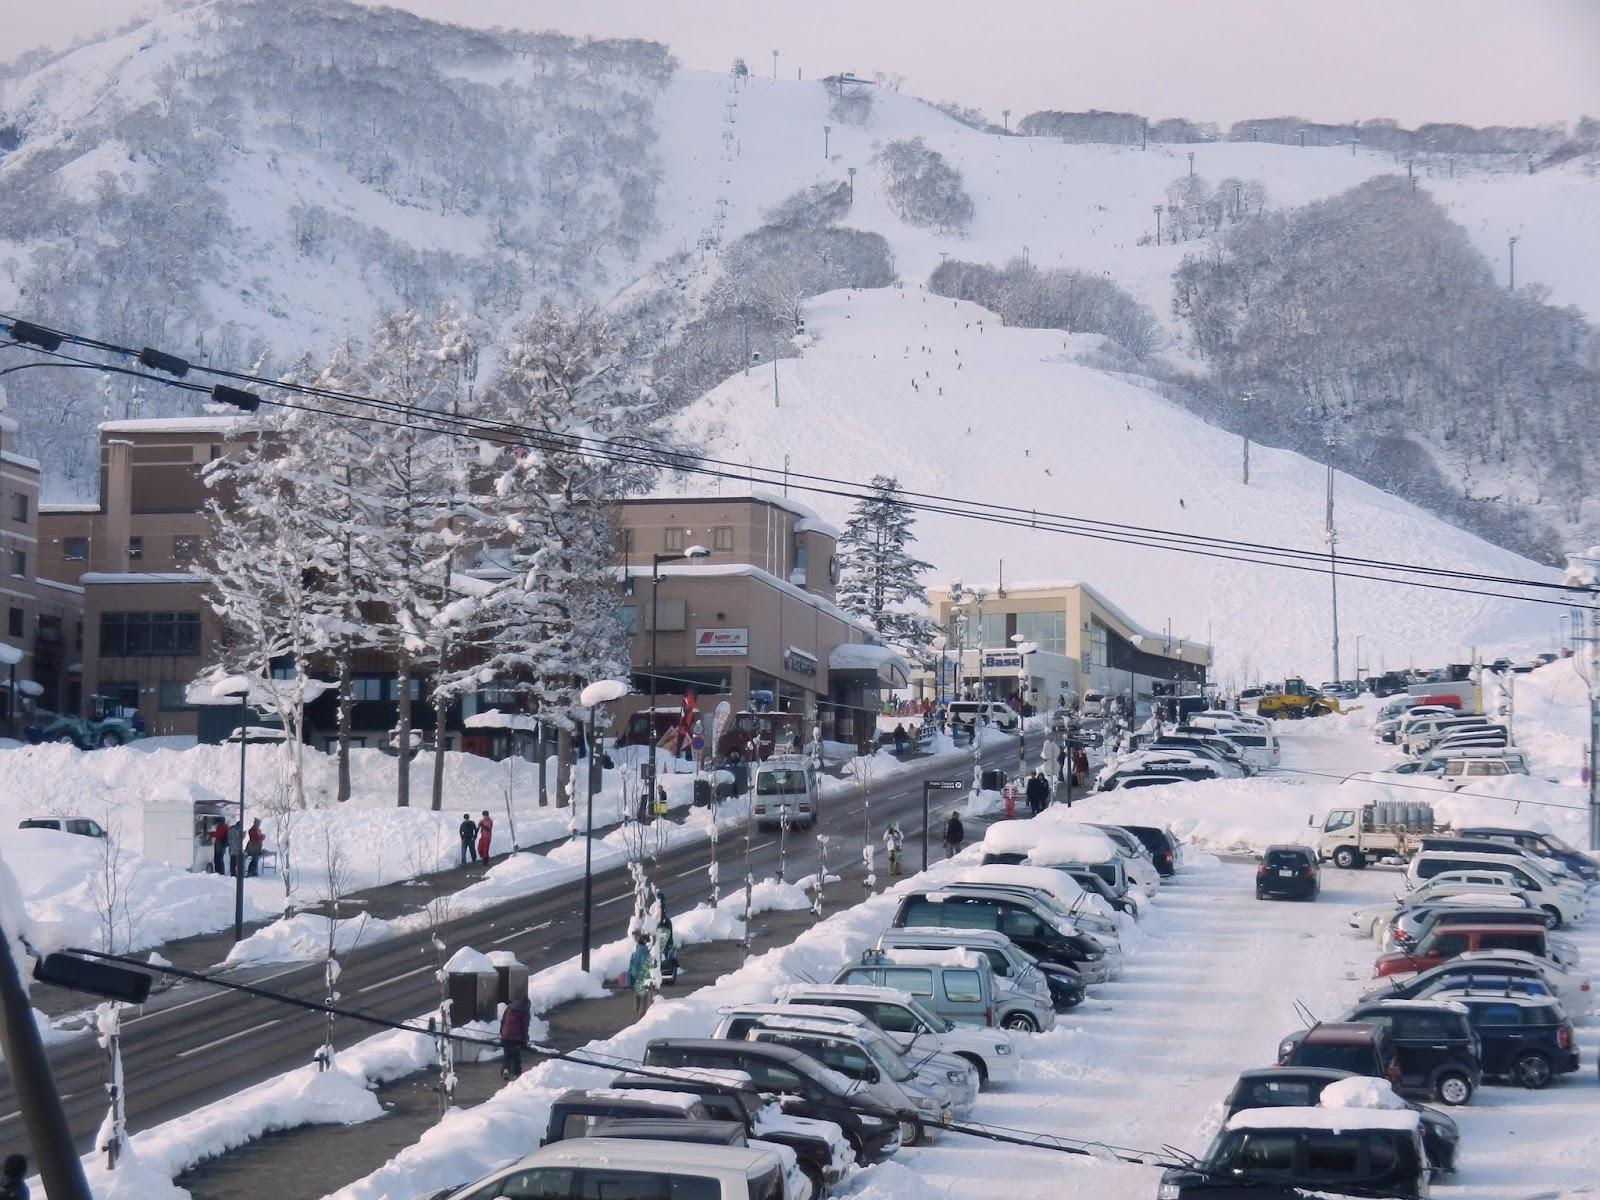 NEWSPAPER ARTICLE ON THE ASAHI SHIMBUN | The Chalet Ivy Blog - photo#38